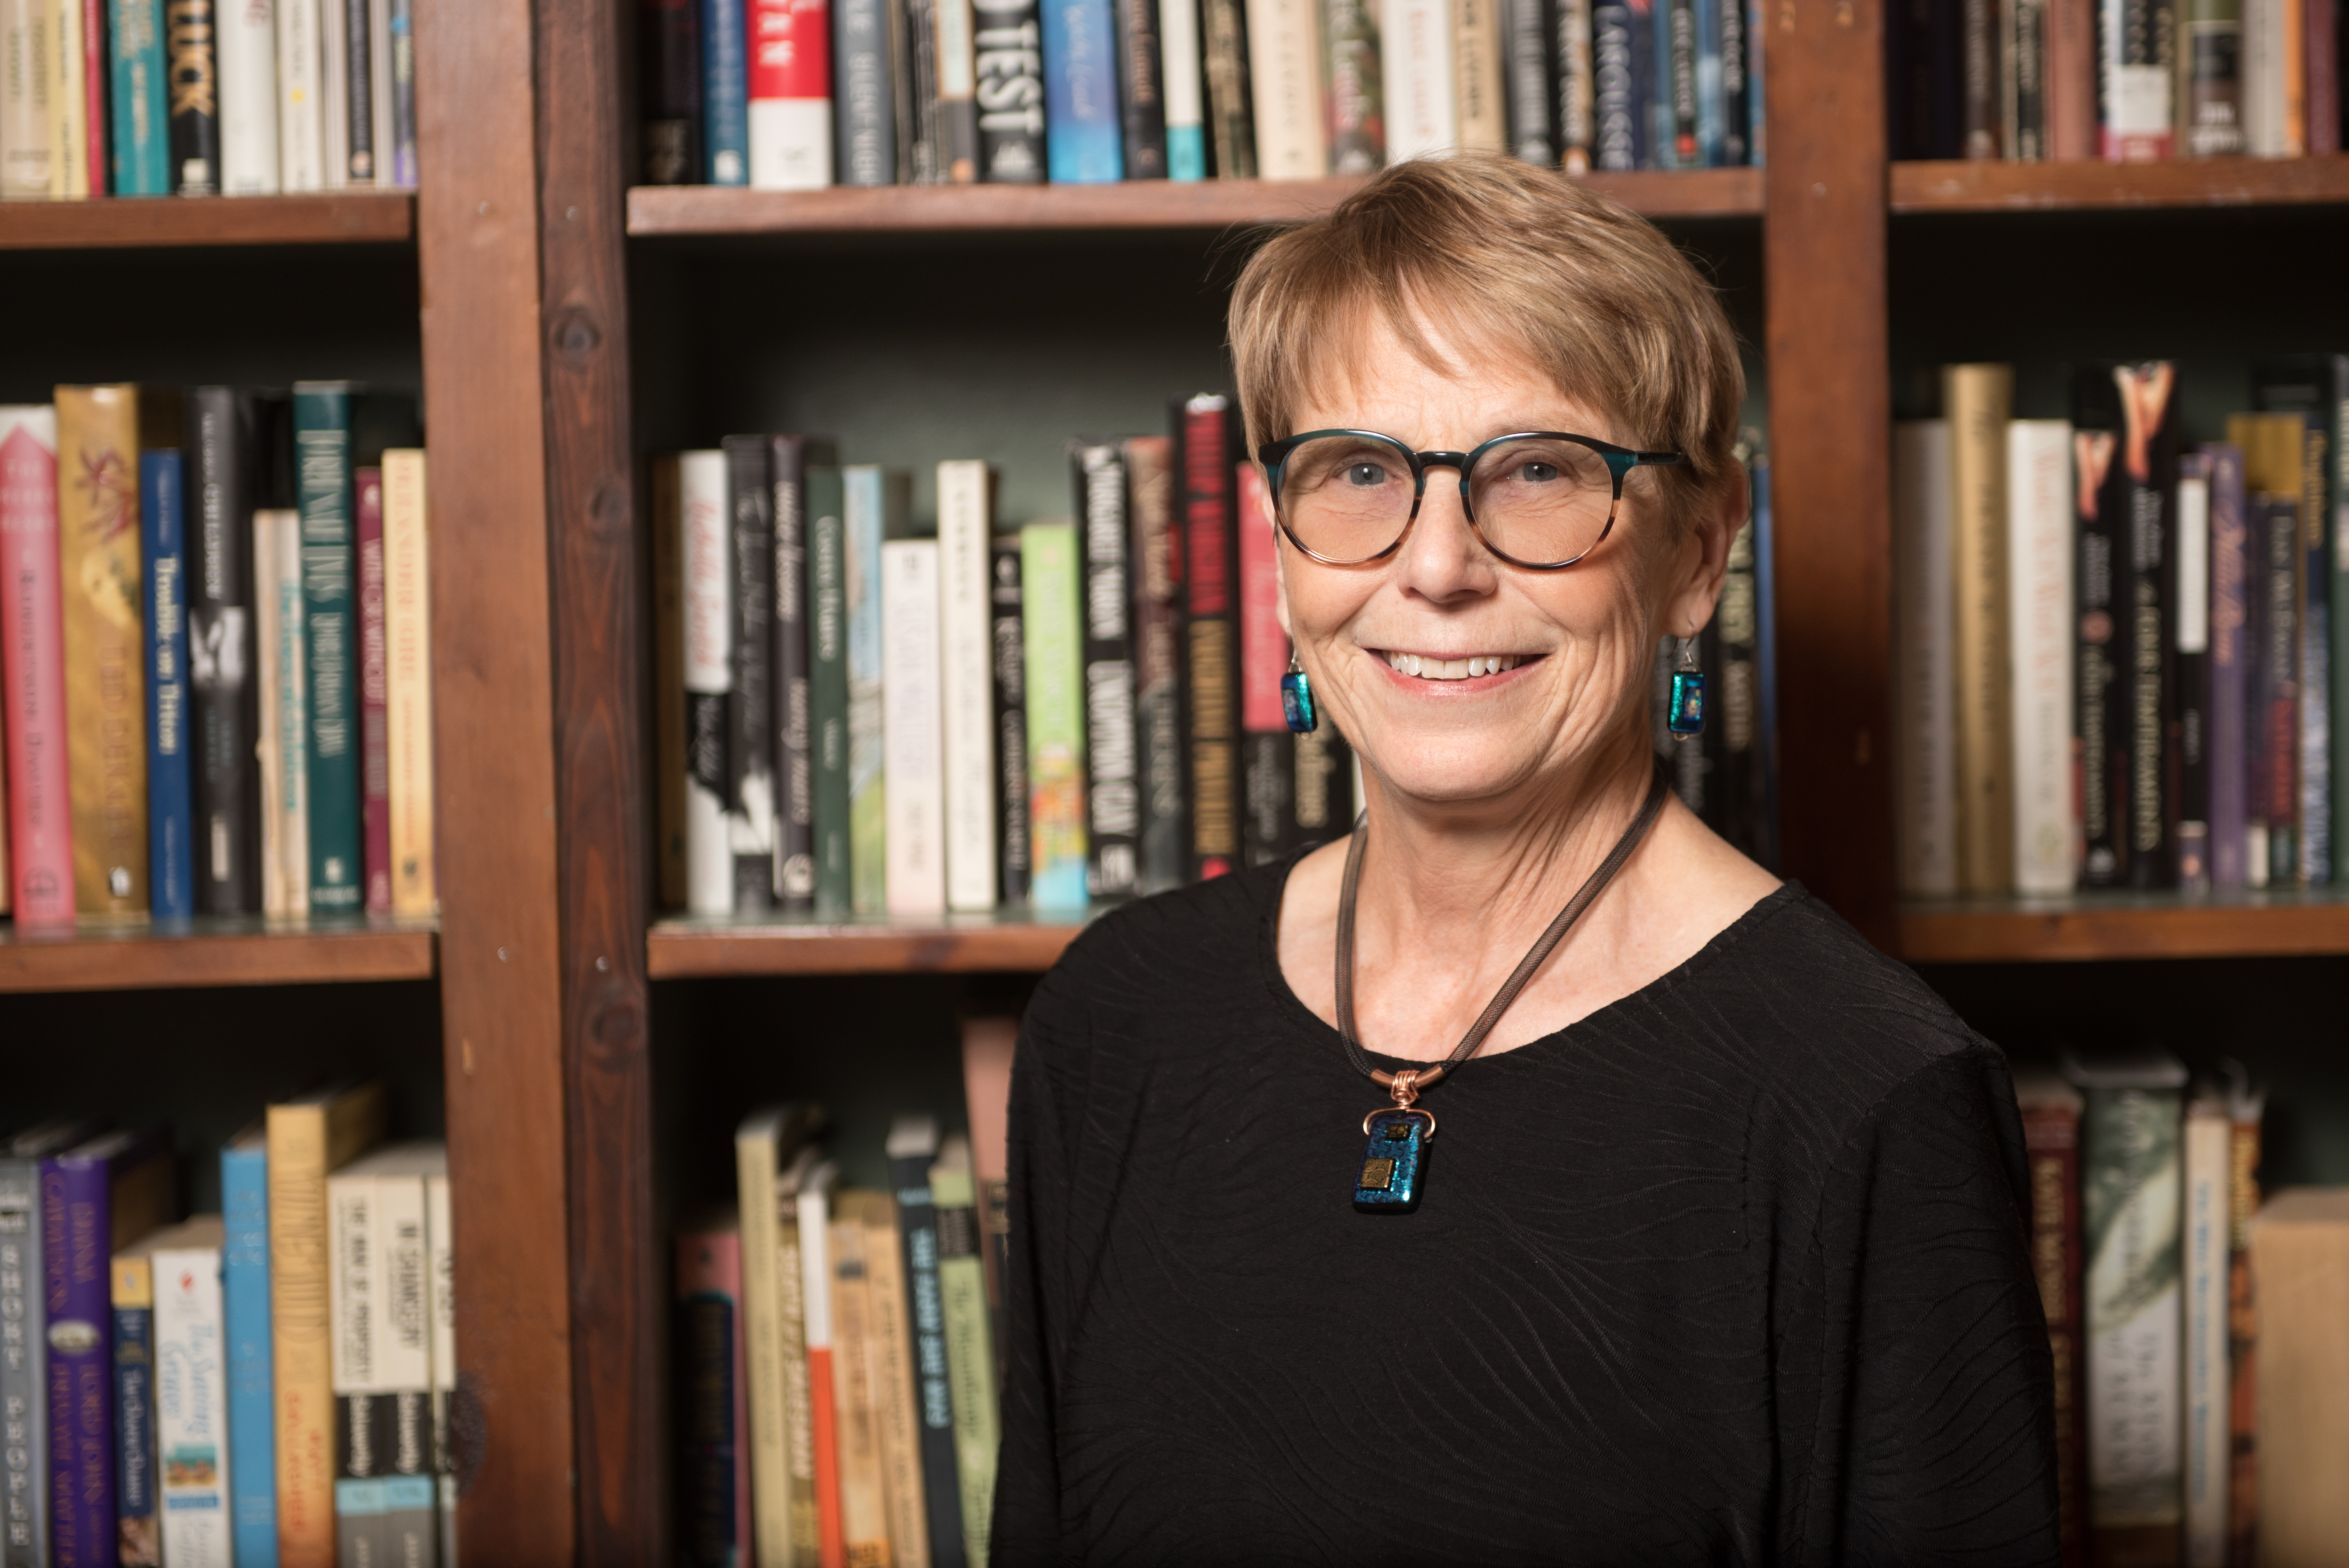 Susan Hynds